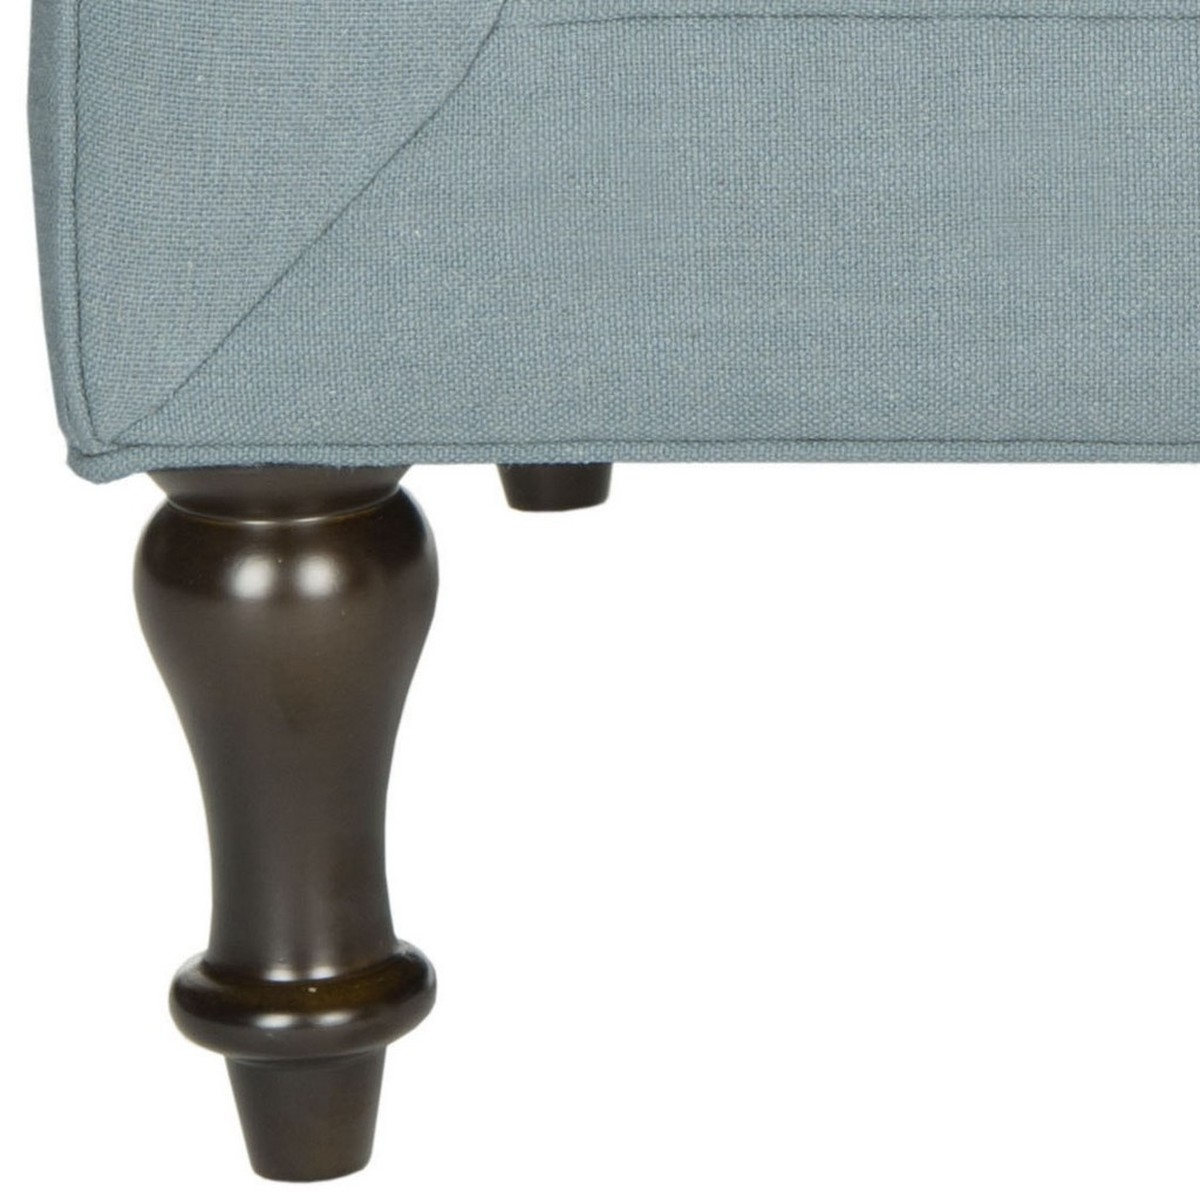 Safavieh Jack Sky Blue Corner Chair Home Decor Accent: MCR4643B Accent Chairs